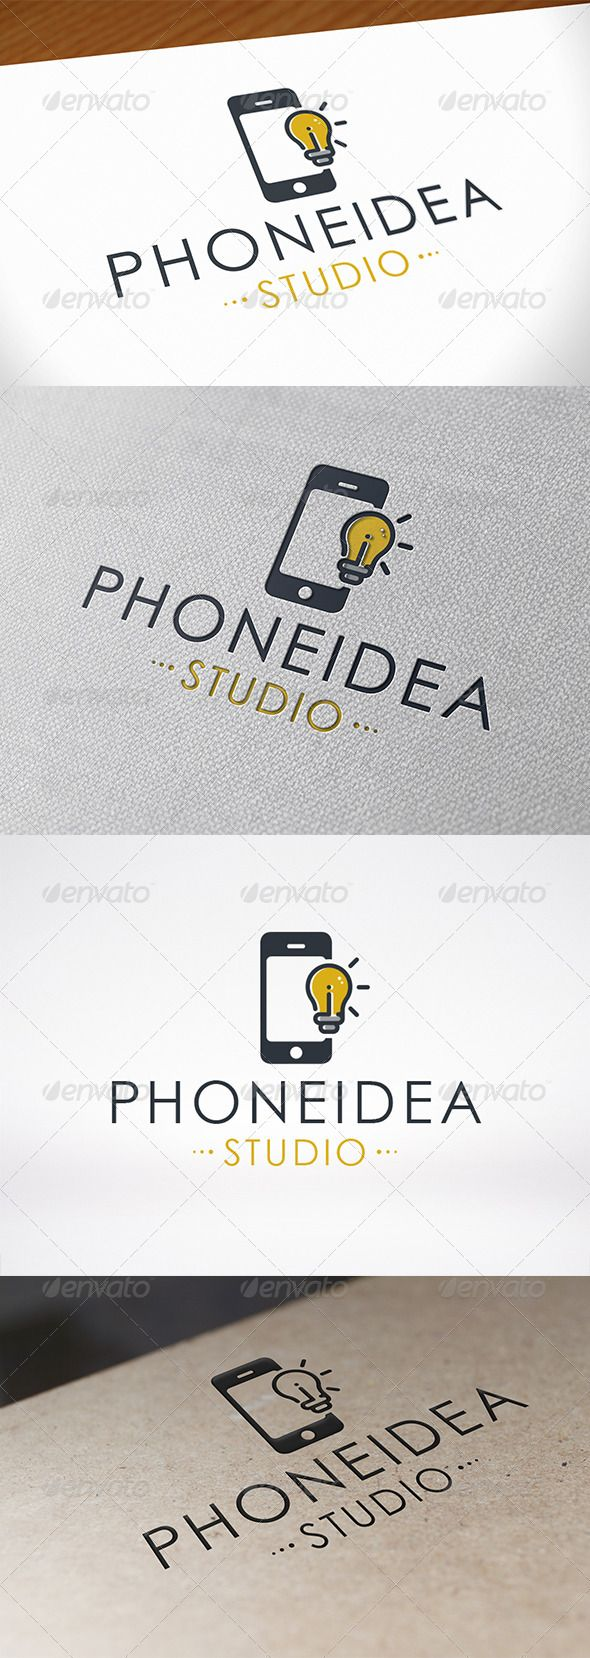 50 best Logo Templates images on Pinterest   Font logo, Logo ...